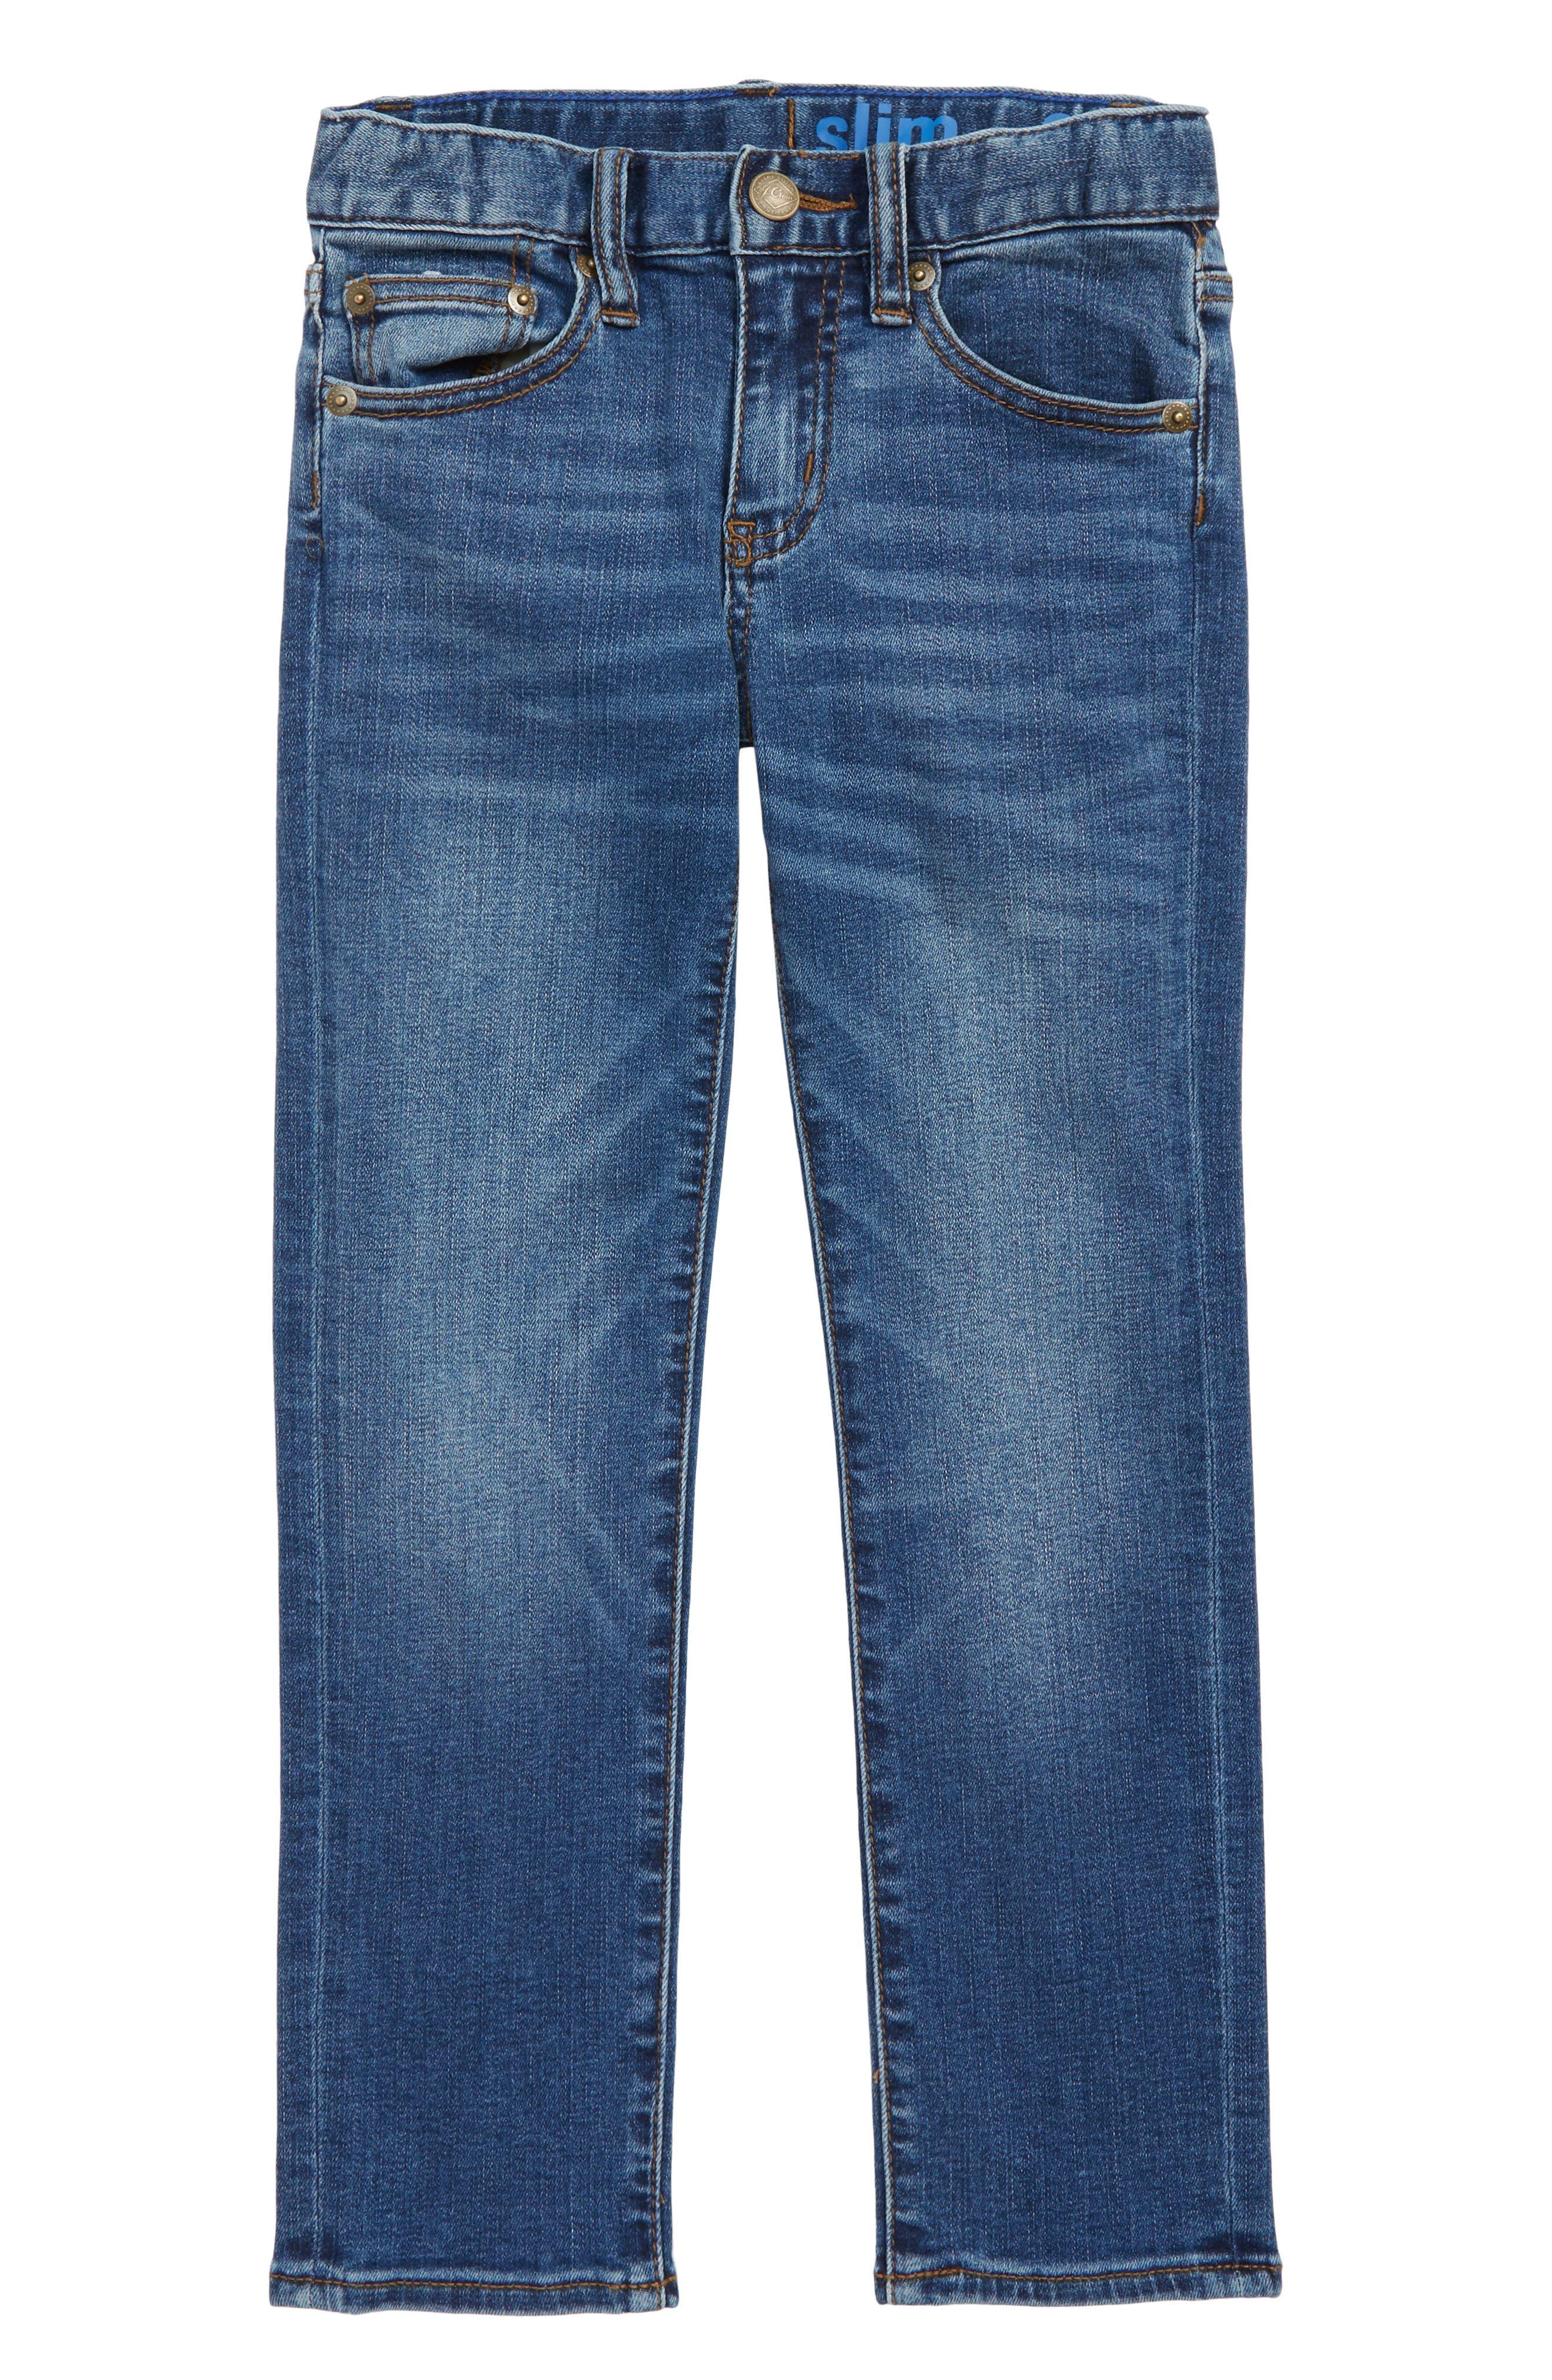 Runaround Slim Fit Jeans,                         Main,                         color, 400